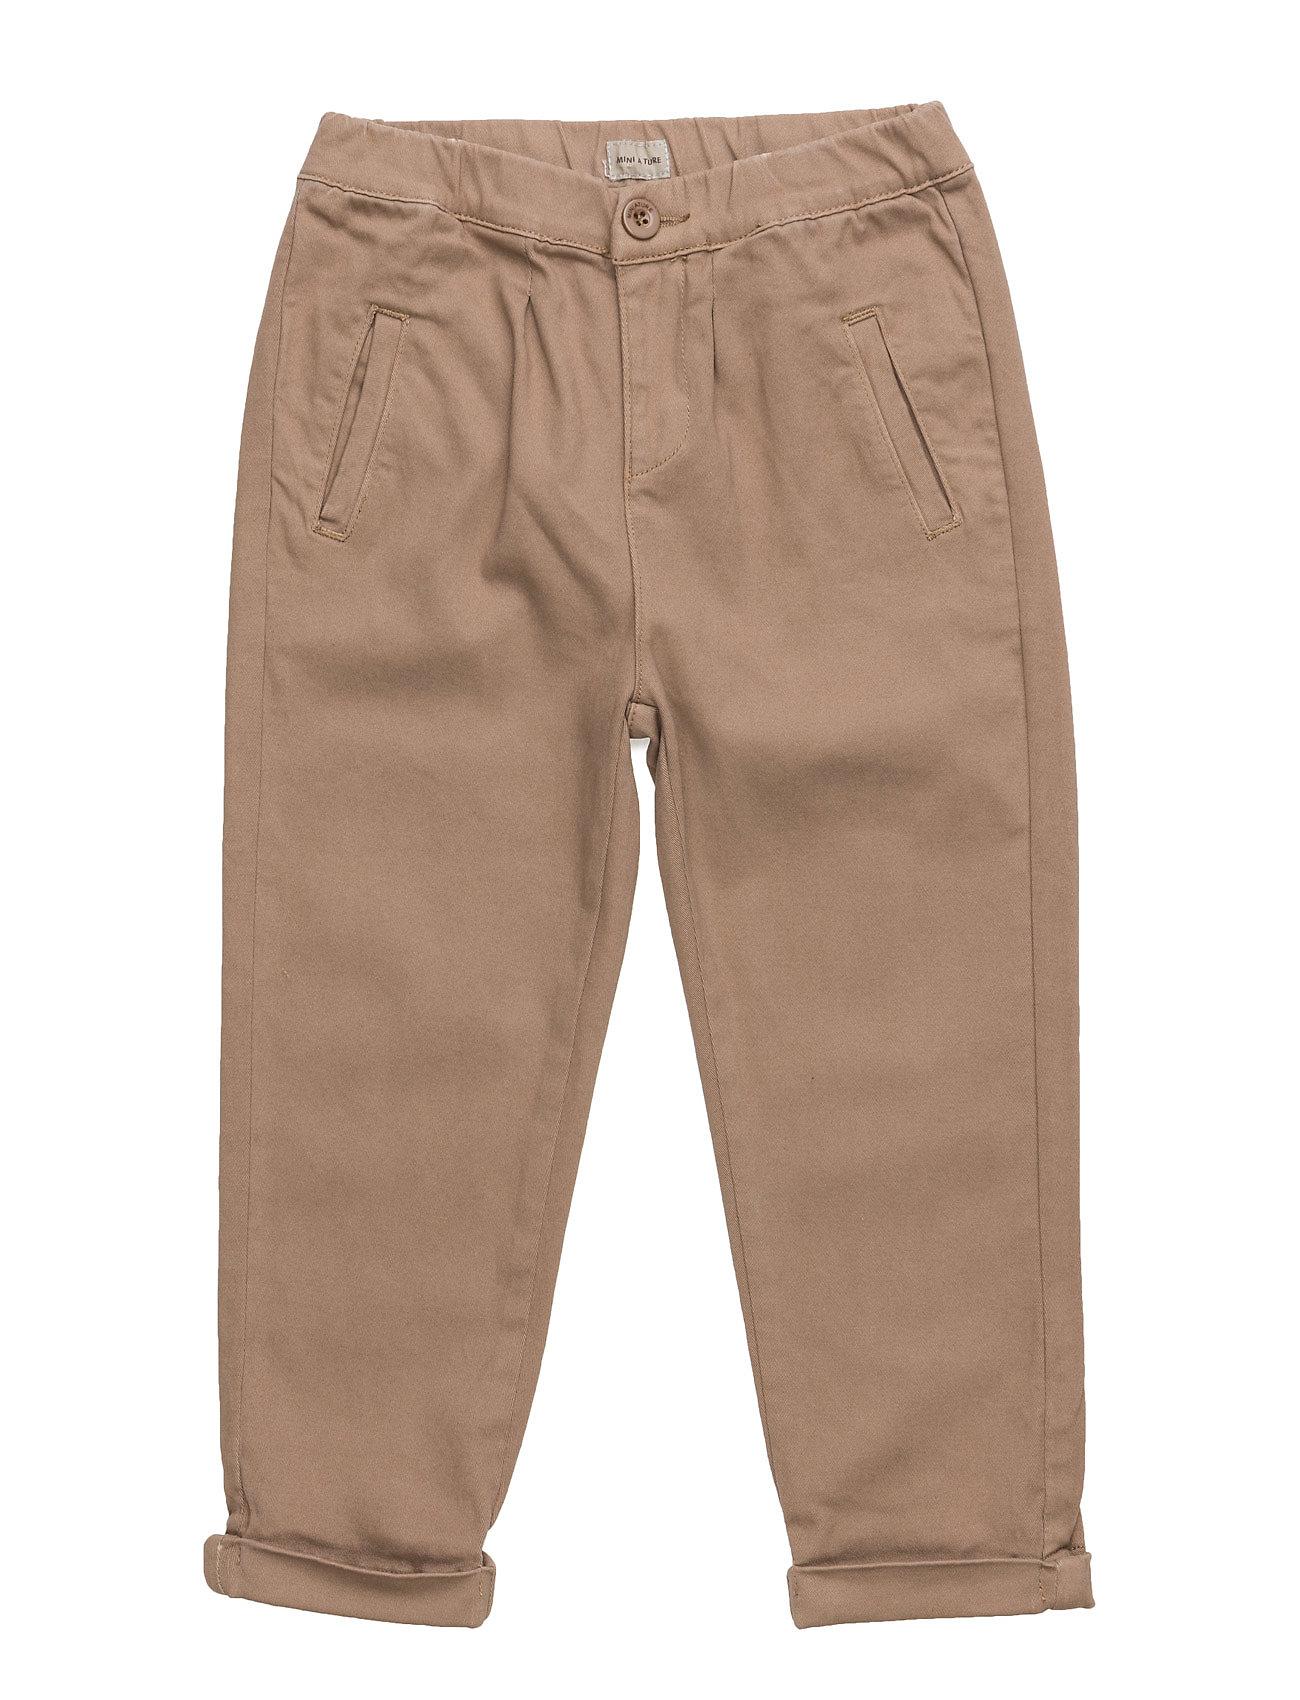 Mini A Ture Bohart, M Pants